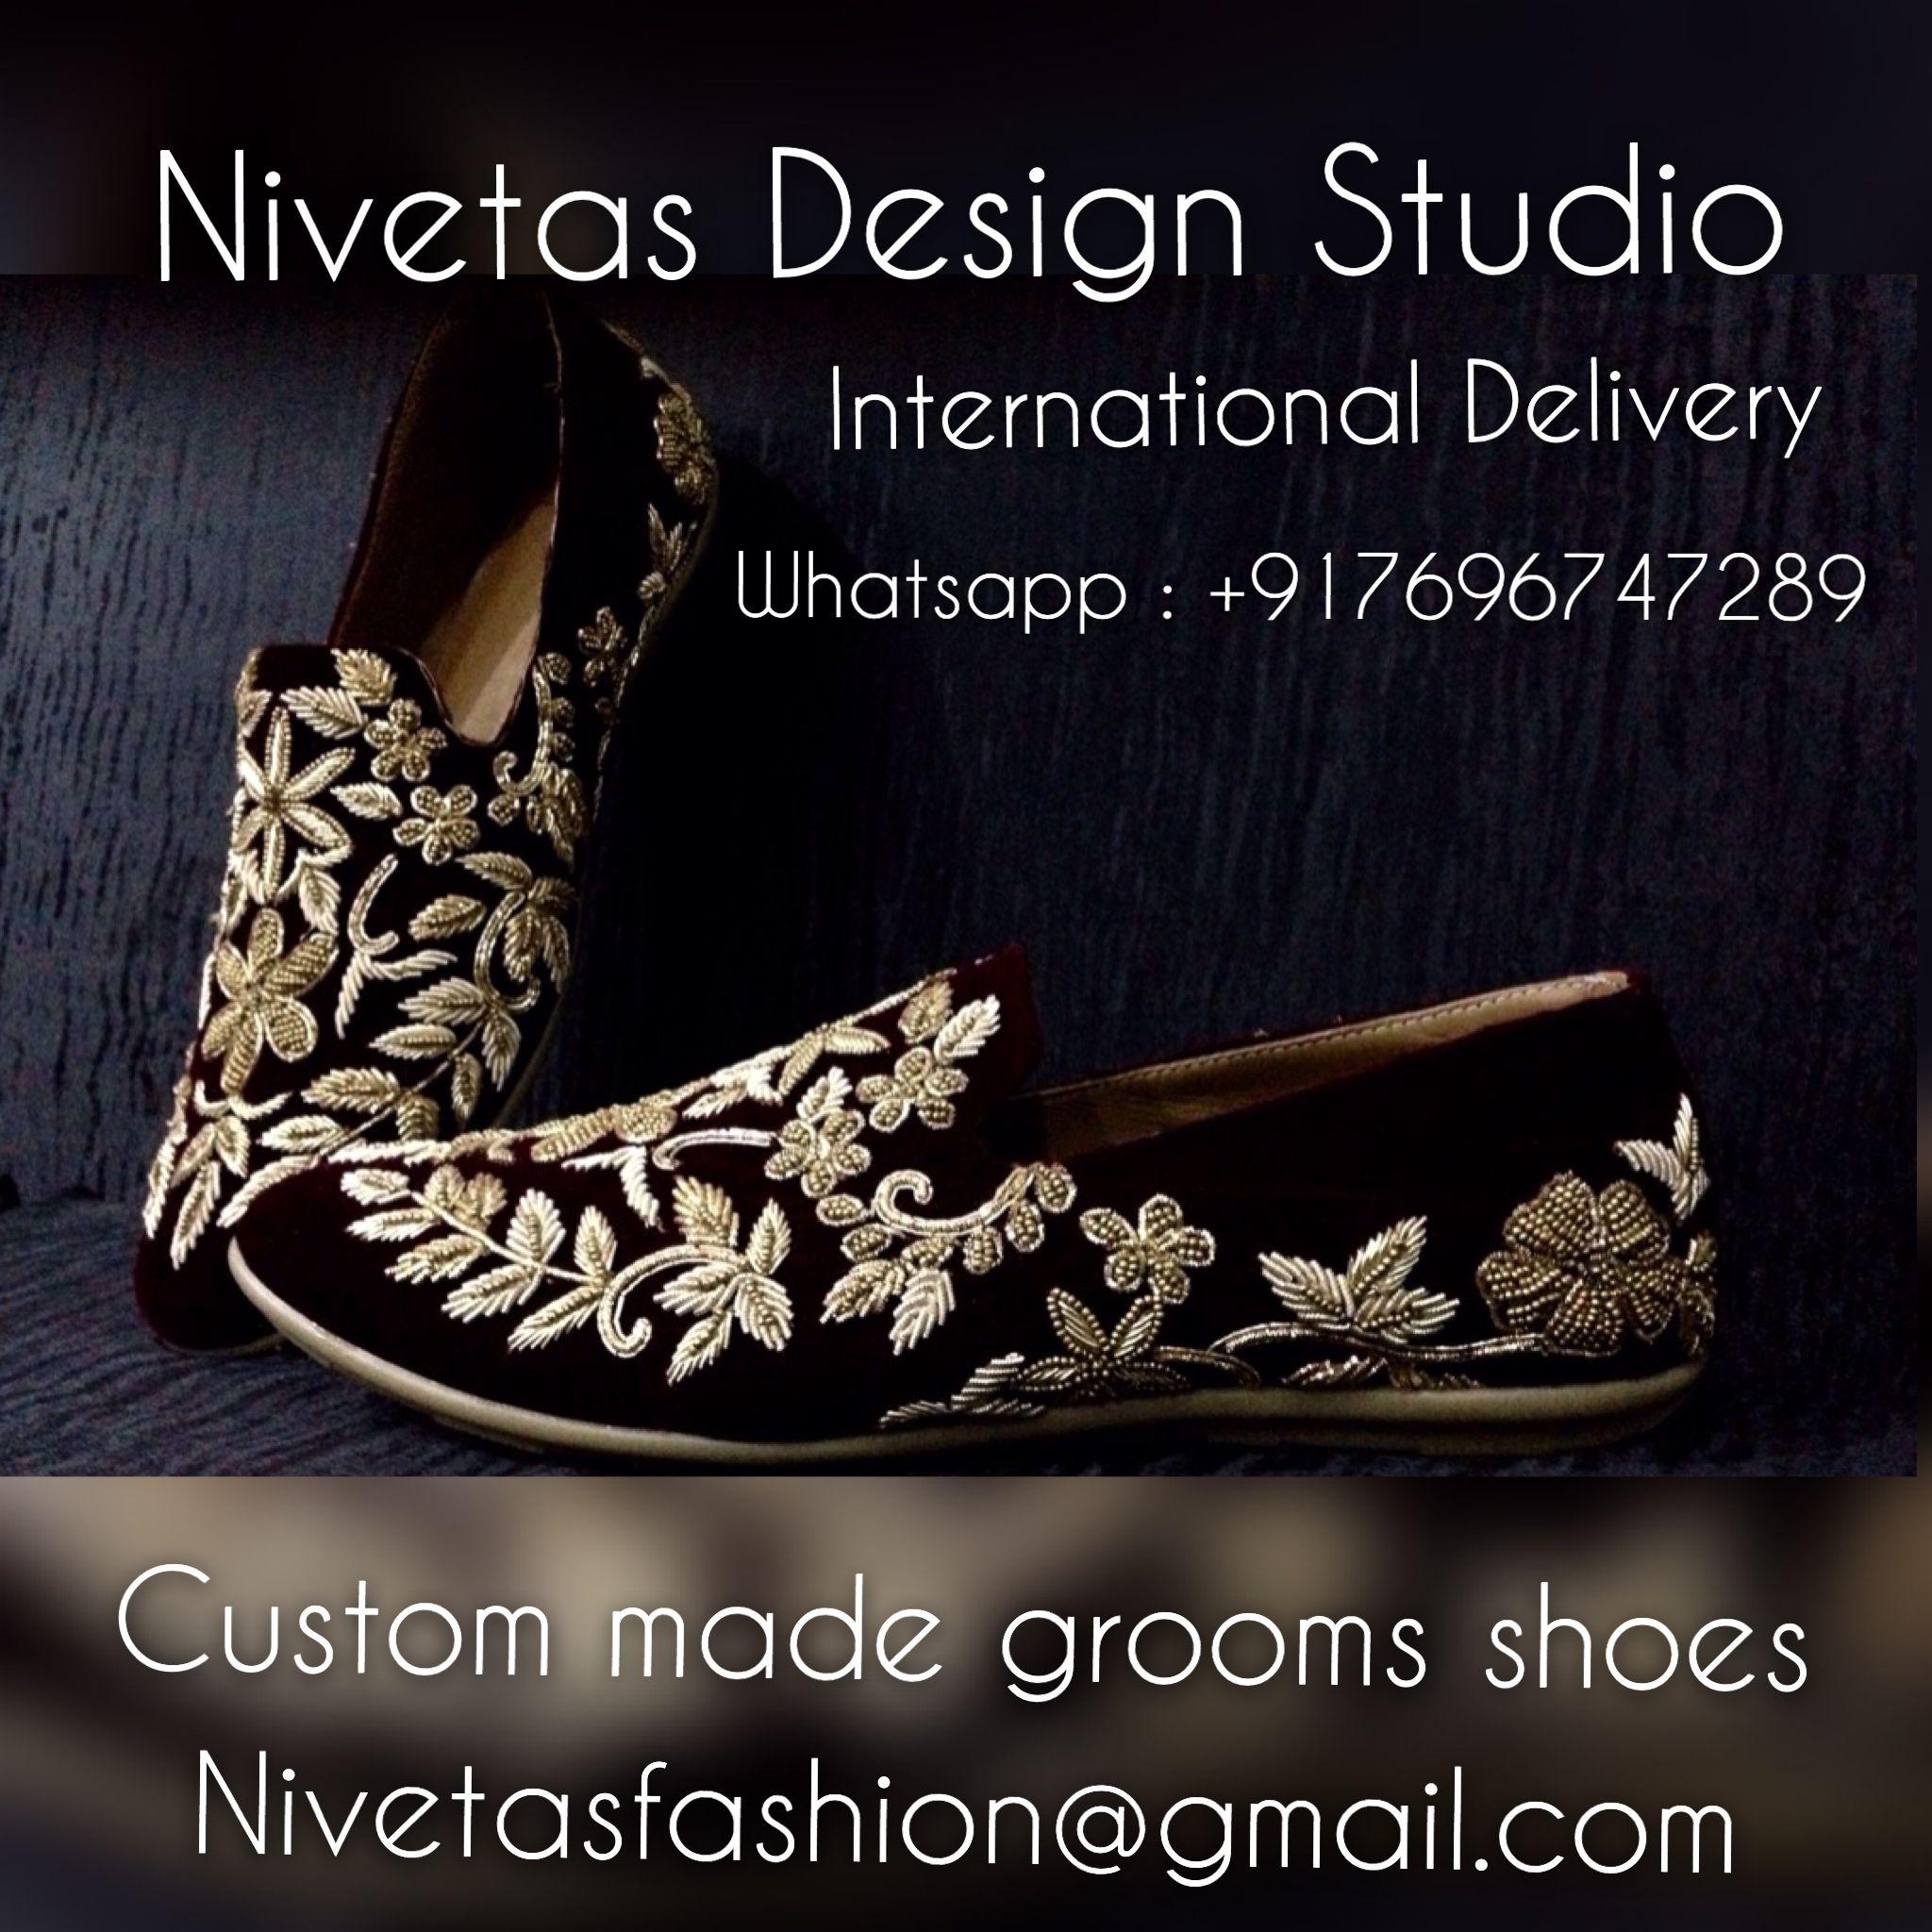 Grooms men shoes Embroidered groom shoes. Nivetas Design studio the soul  manufacturer of embroidered shoes